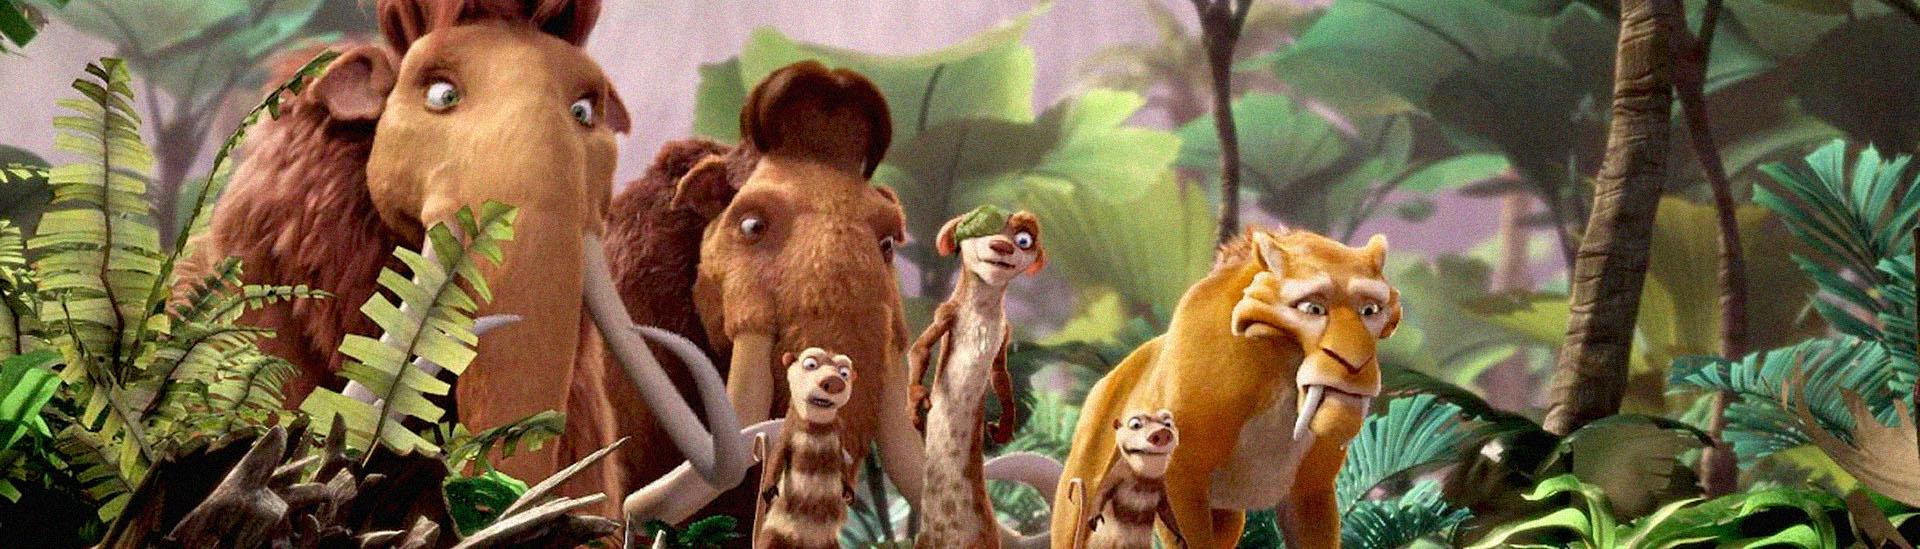 Baner filmu 'Epoka Lodowcowa 3: Era Dinozaurów'